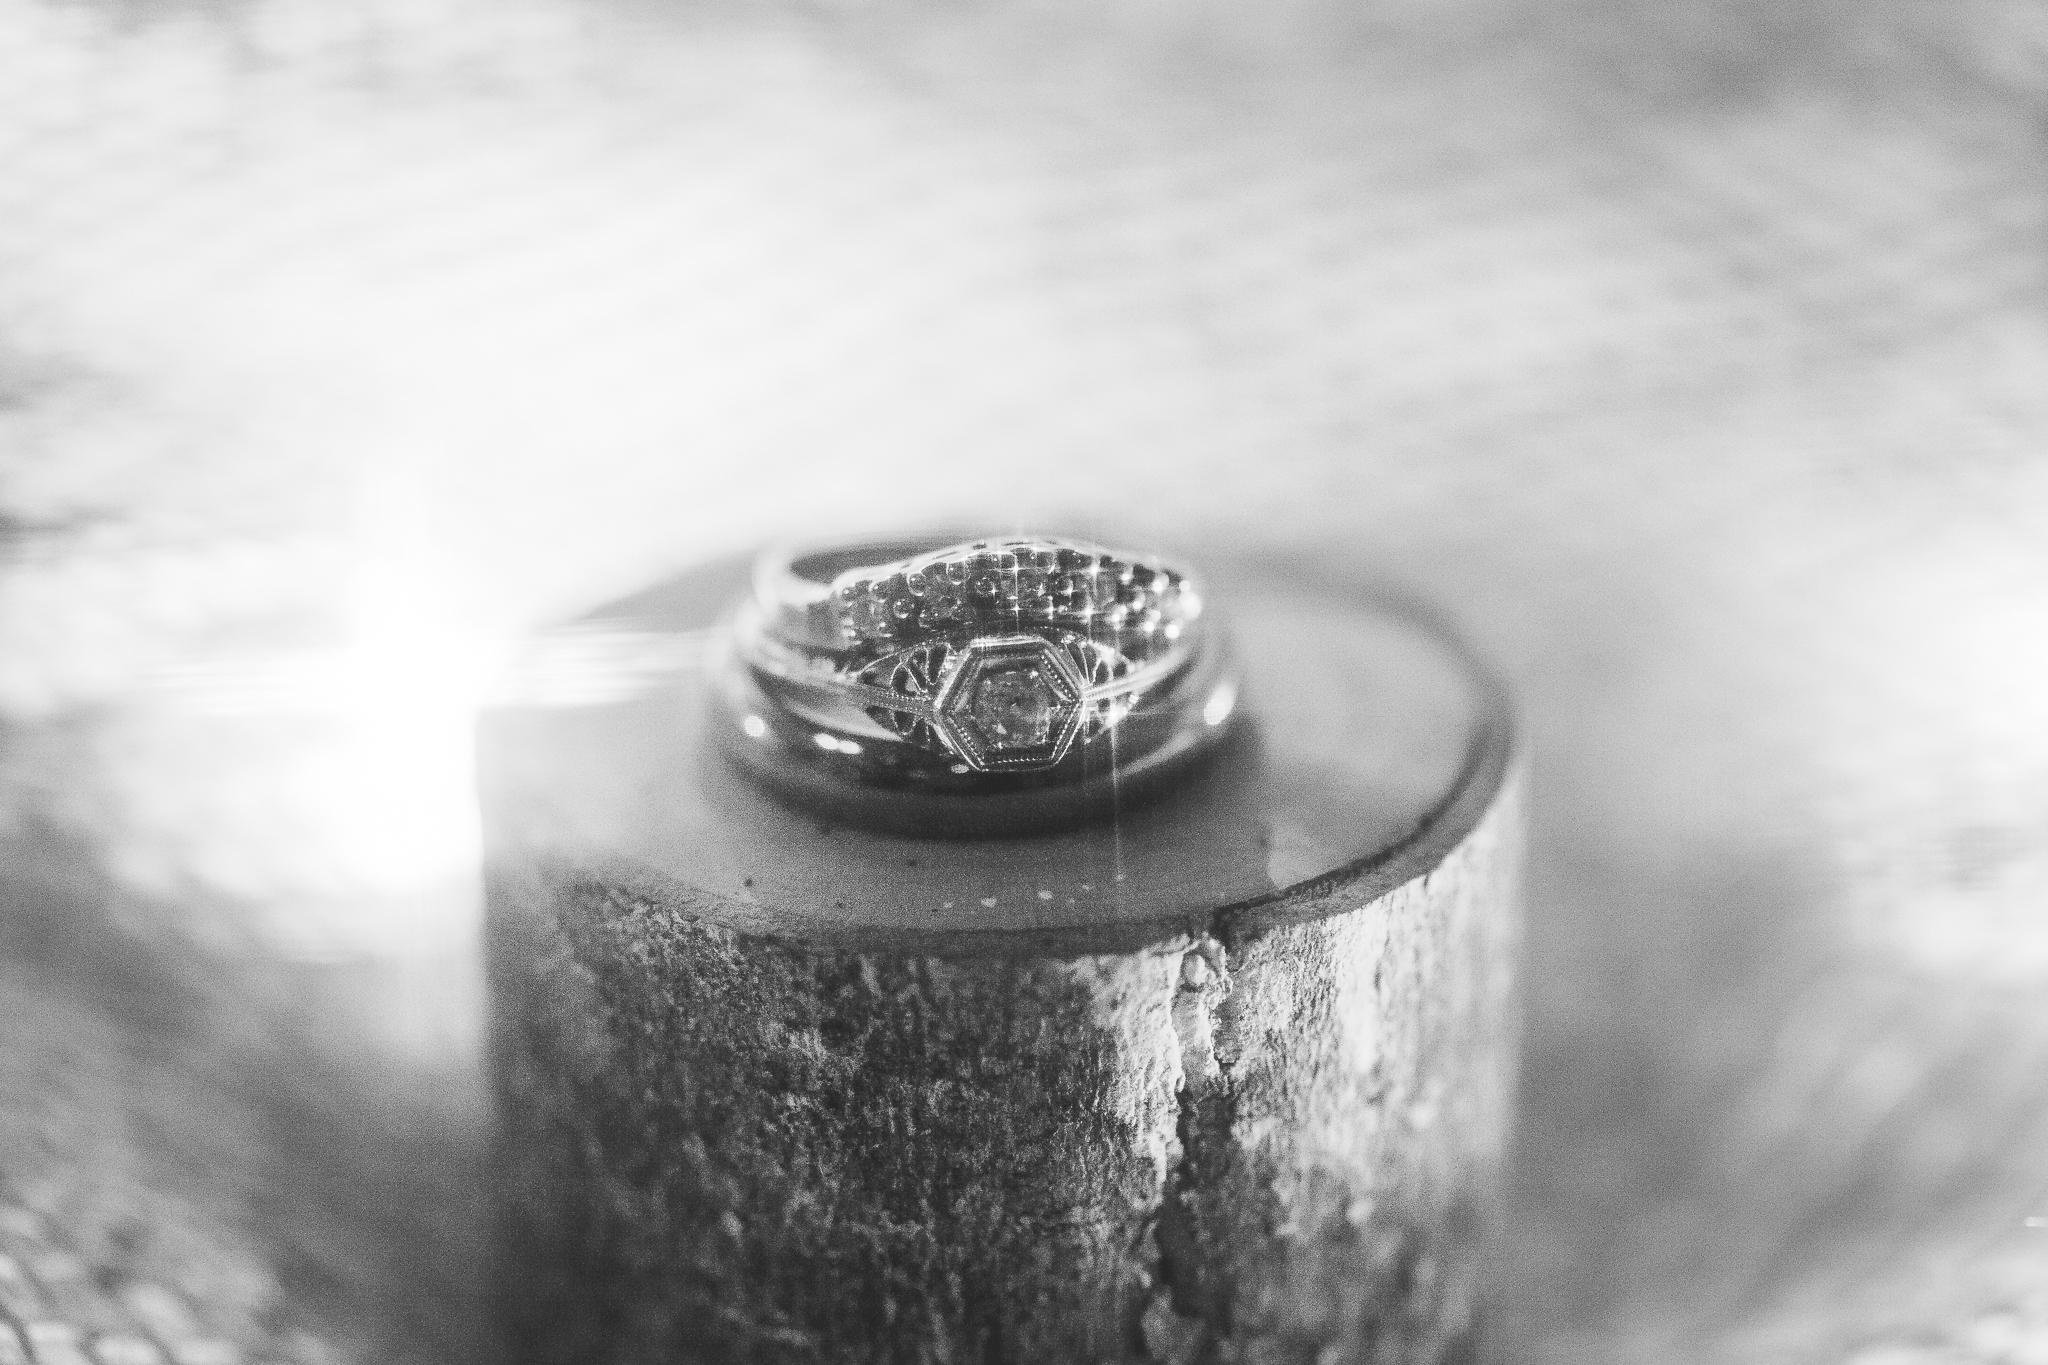 camuglia-whomstudio-chelsea_and_andy-nycphotographer-wedding-brooklyn-buffalo-timberlodge-002-1074.jpg